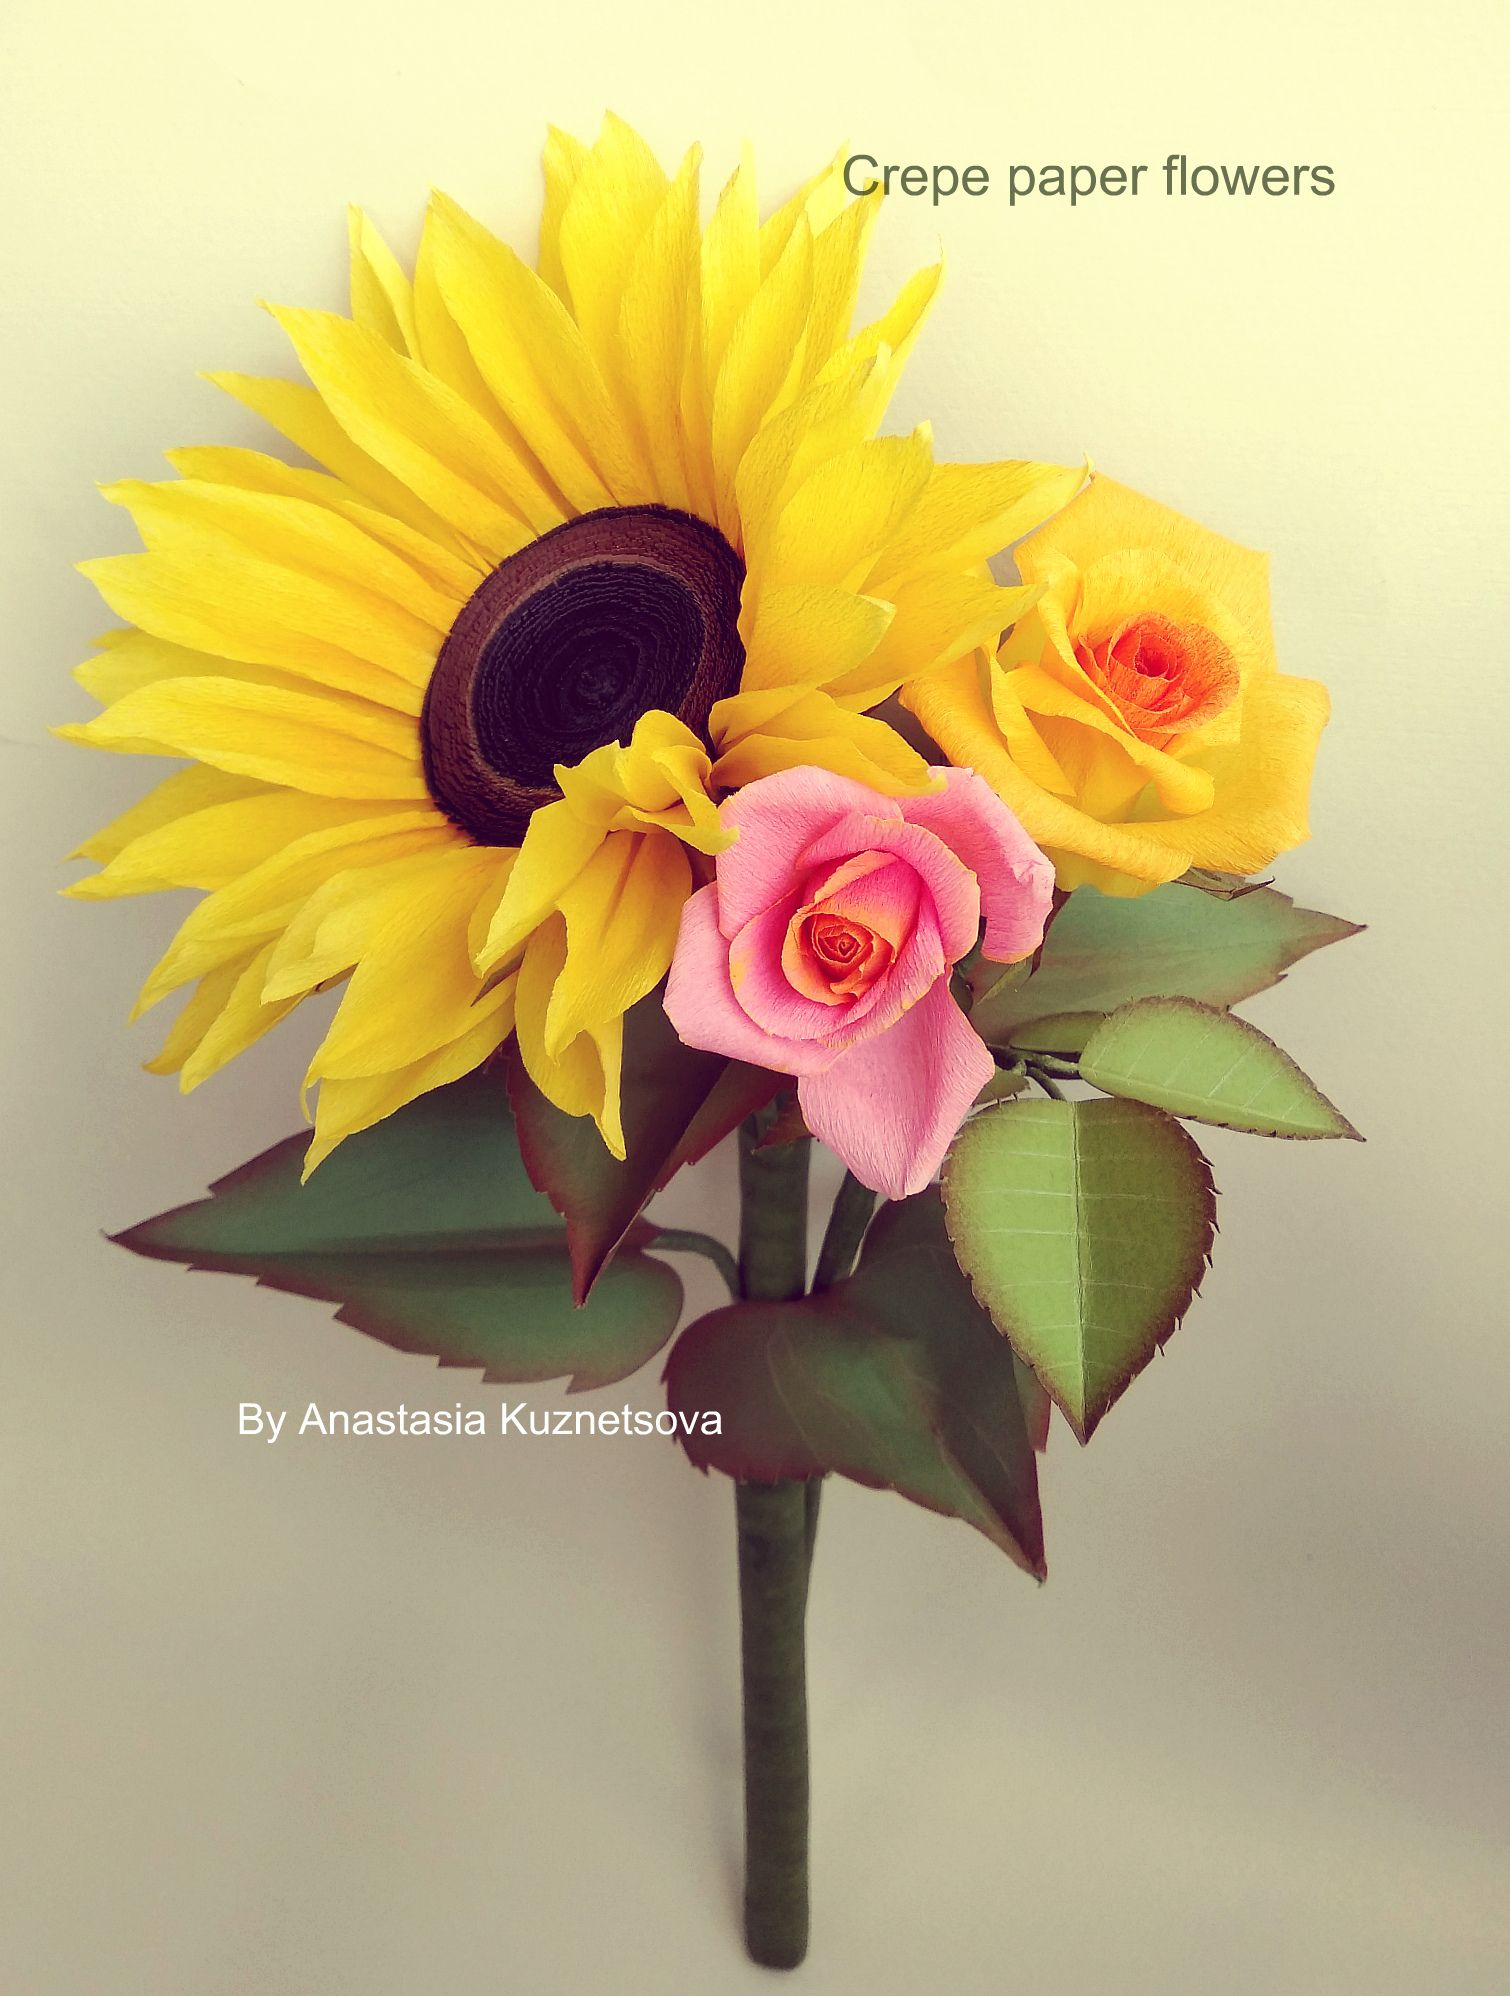 Crepe paper flowers paper sunflower and rose tutorials Flores de